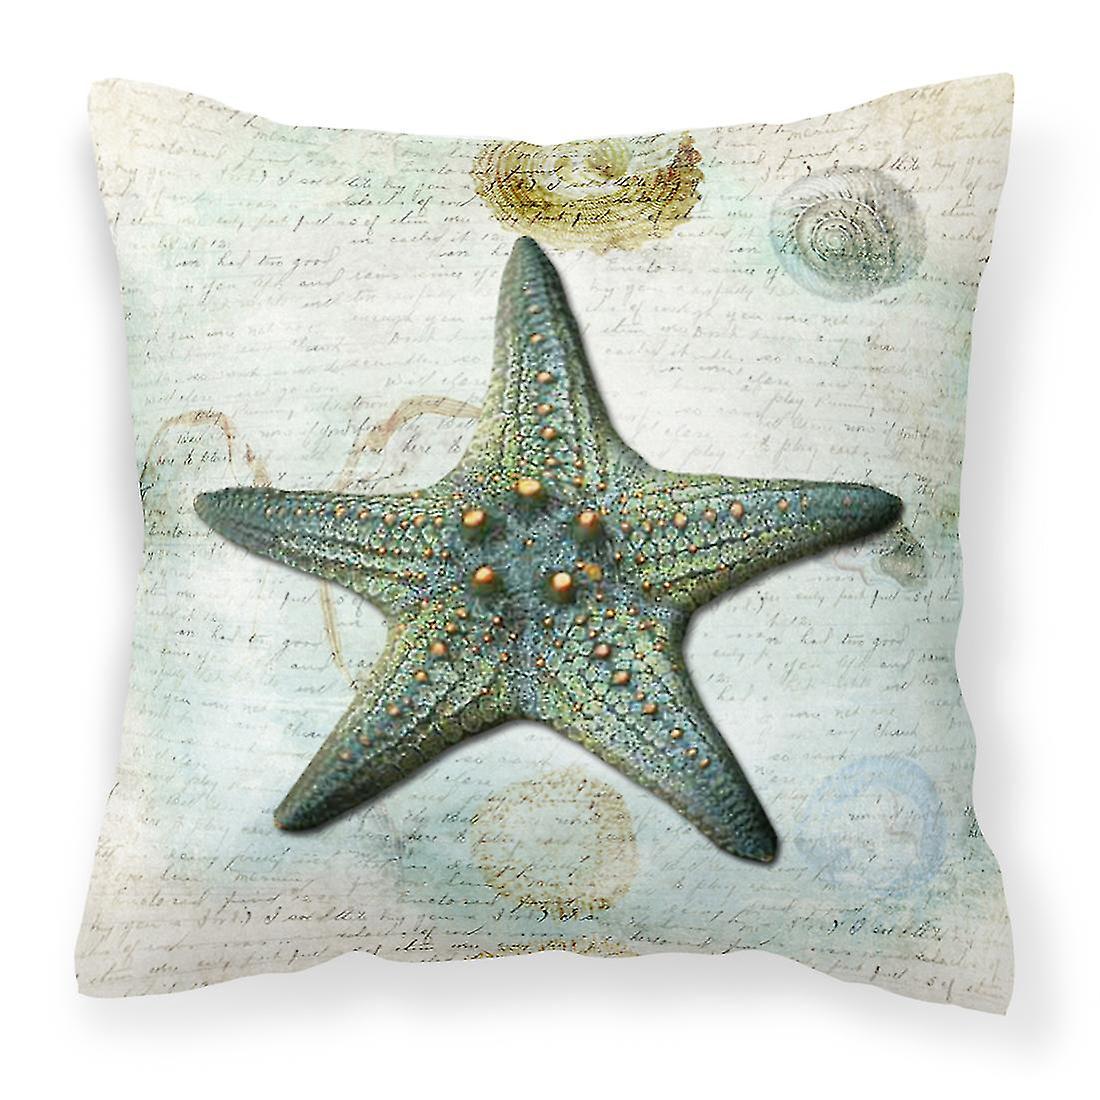 Sb3034pw1414 Décoratif Toile Trésors Tissu Carolines Oreiller Starfish rCtsQdh